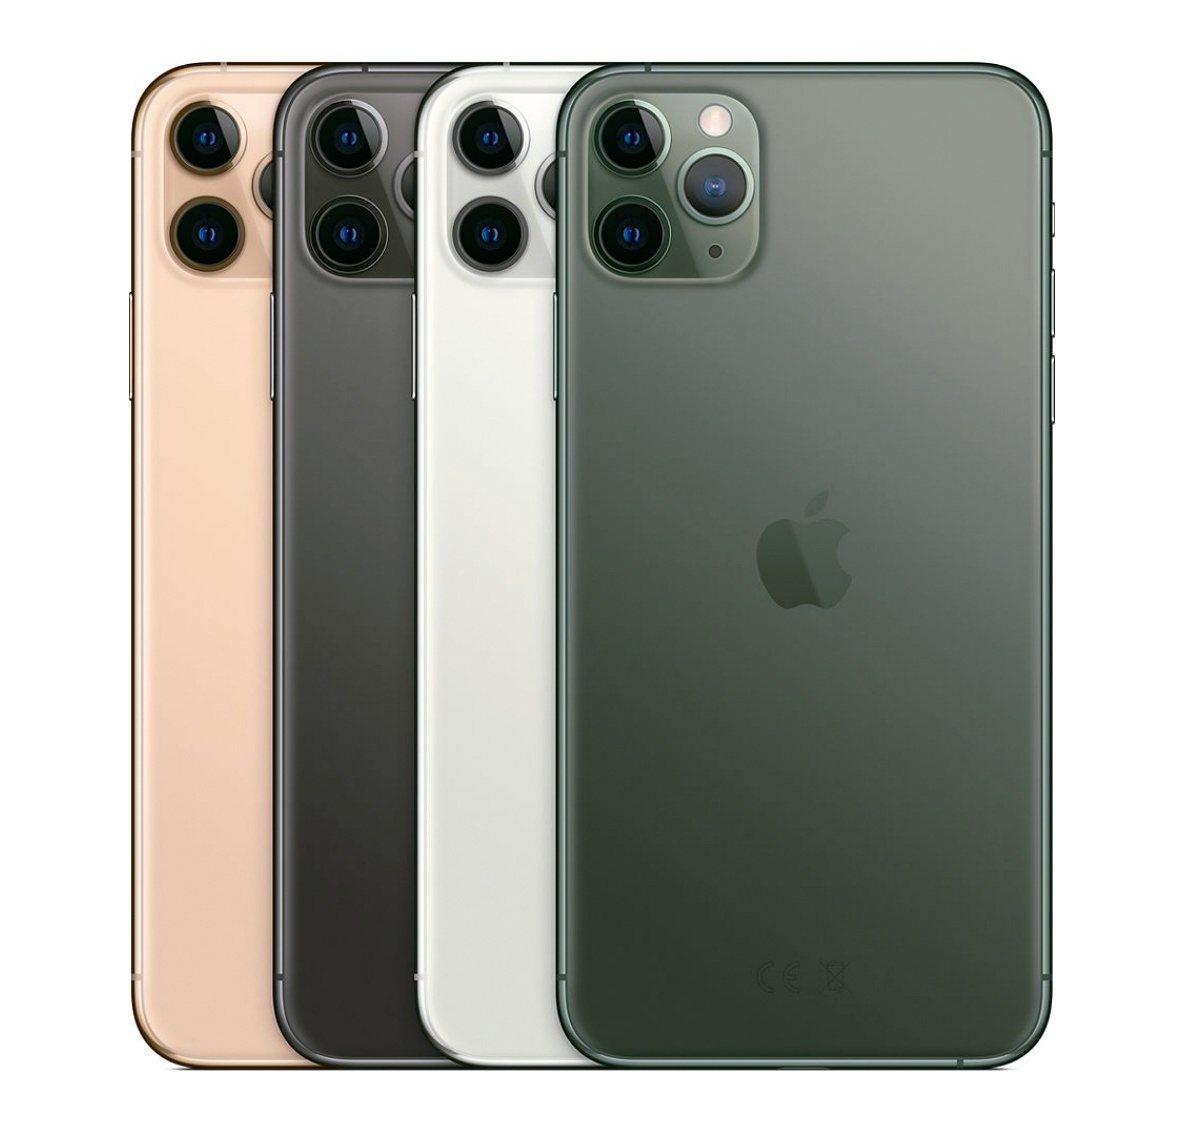 復興館APPLE iPhone 11 PRO MAX 64G售價39,900元,...